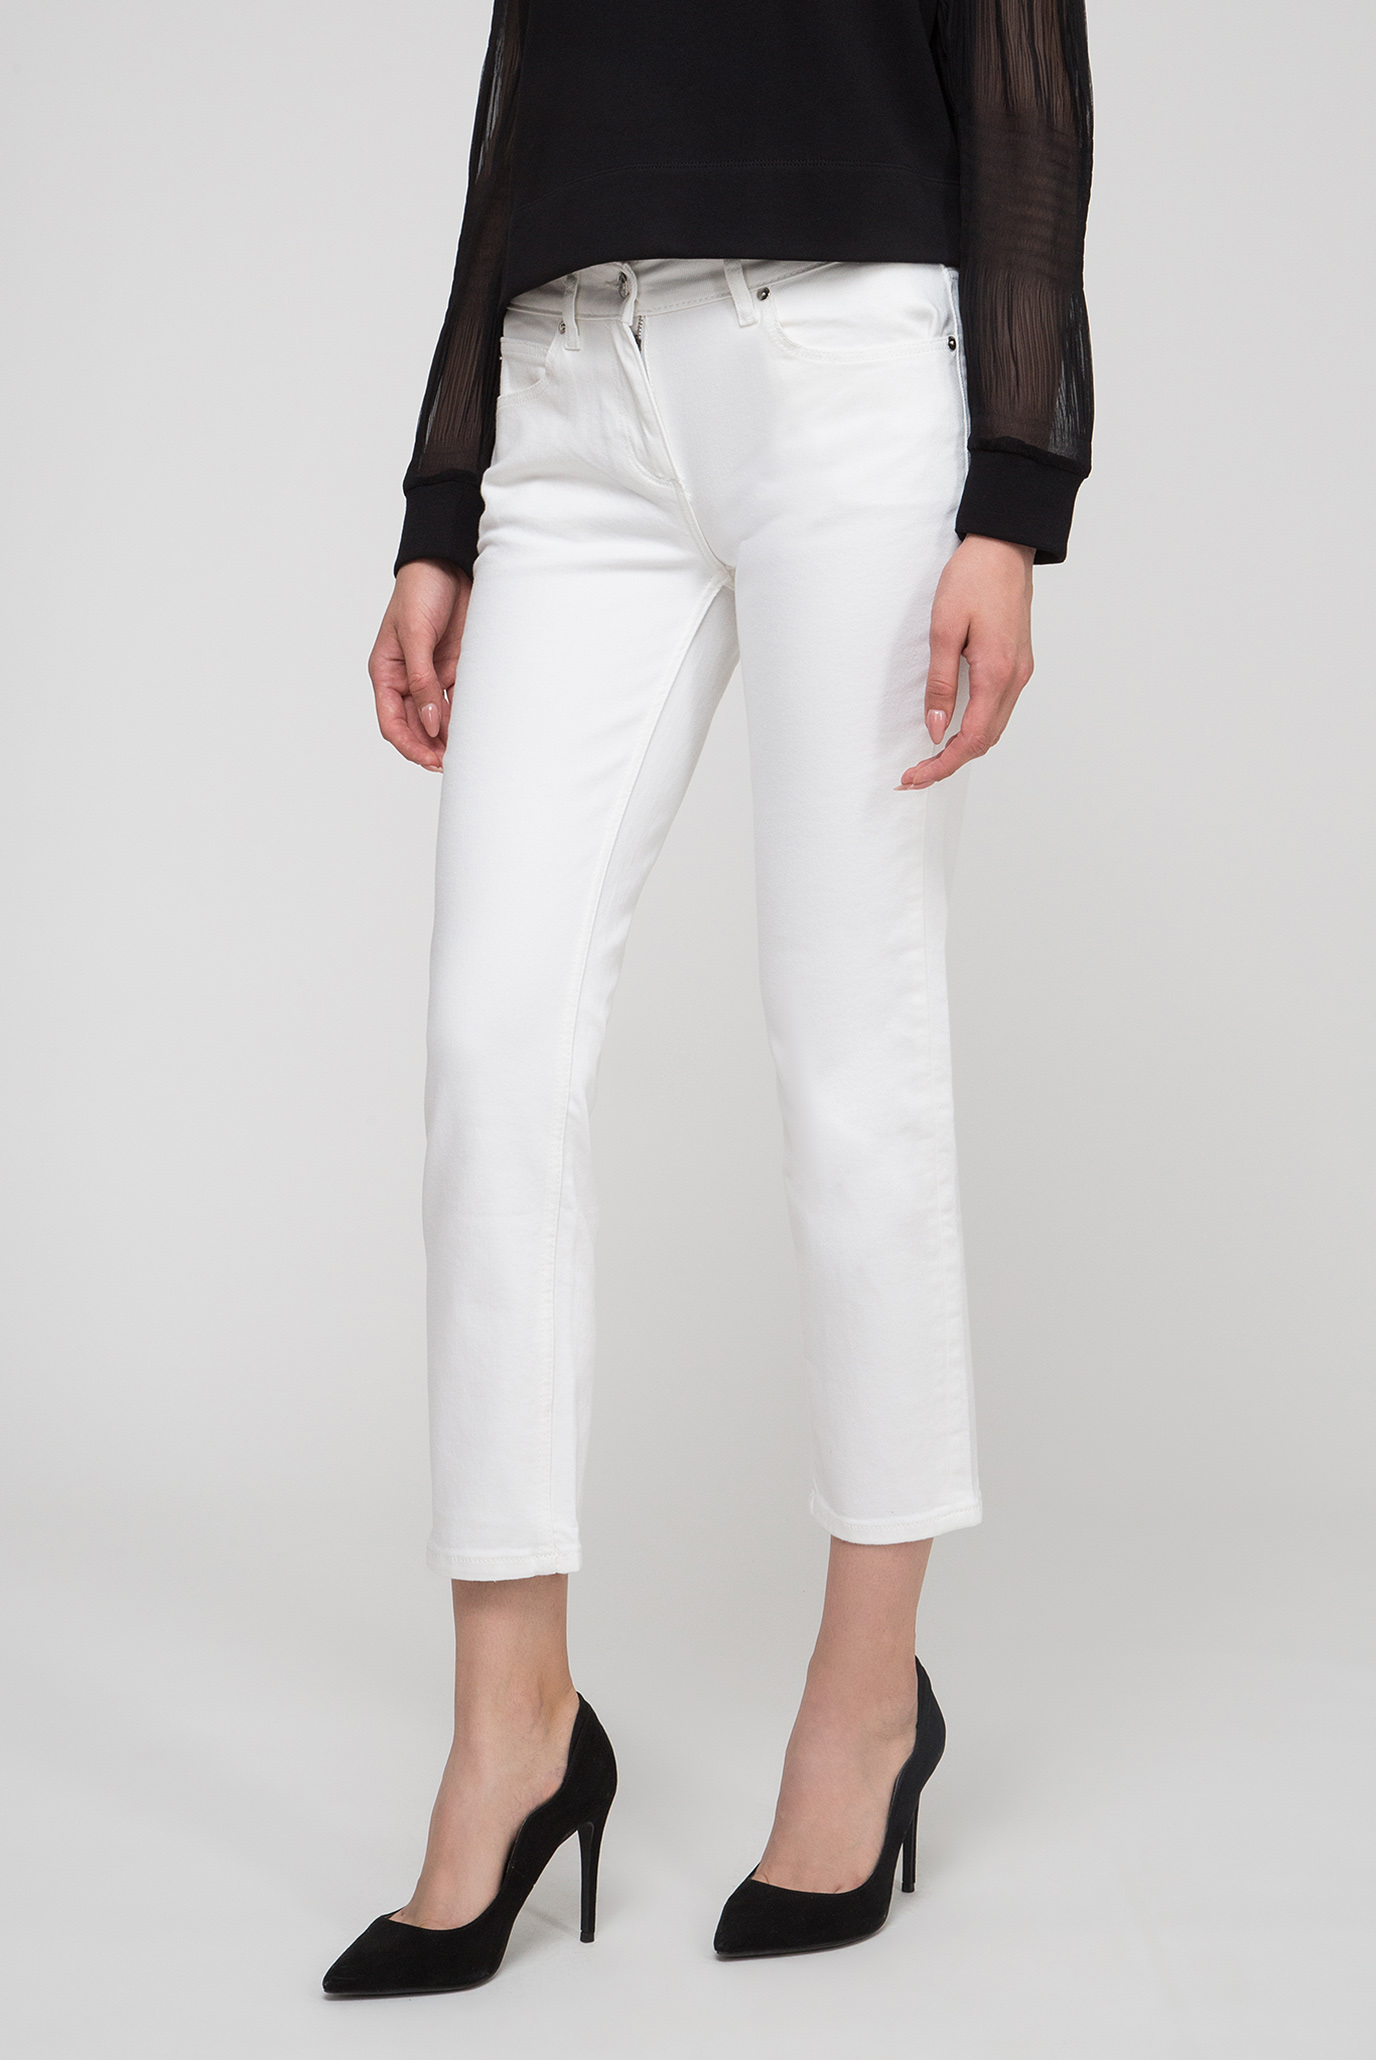 Купить Женские белые джинсы SLL 5PKT JEAN ANKLE Calvin Klein Calvin Klein K20K200605 – Киев, Украина. Цены в интернет магазине MD Fashion